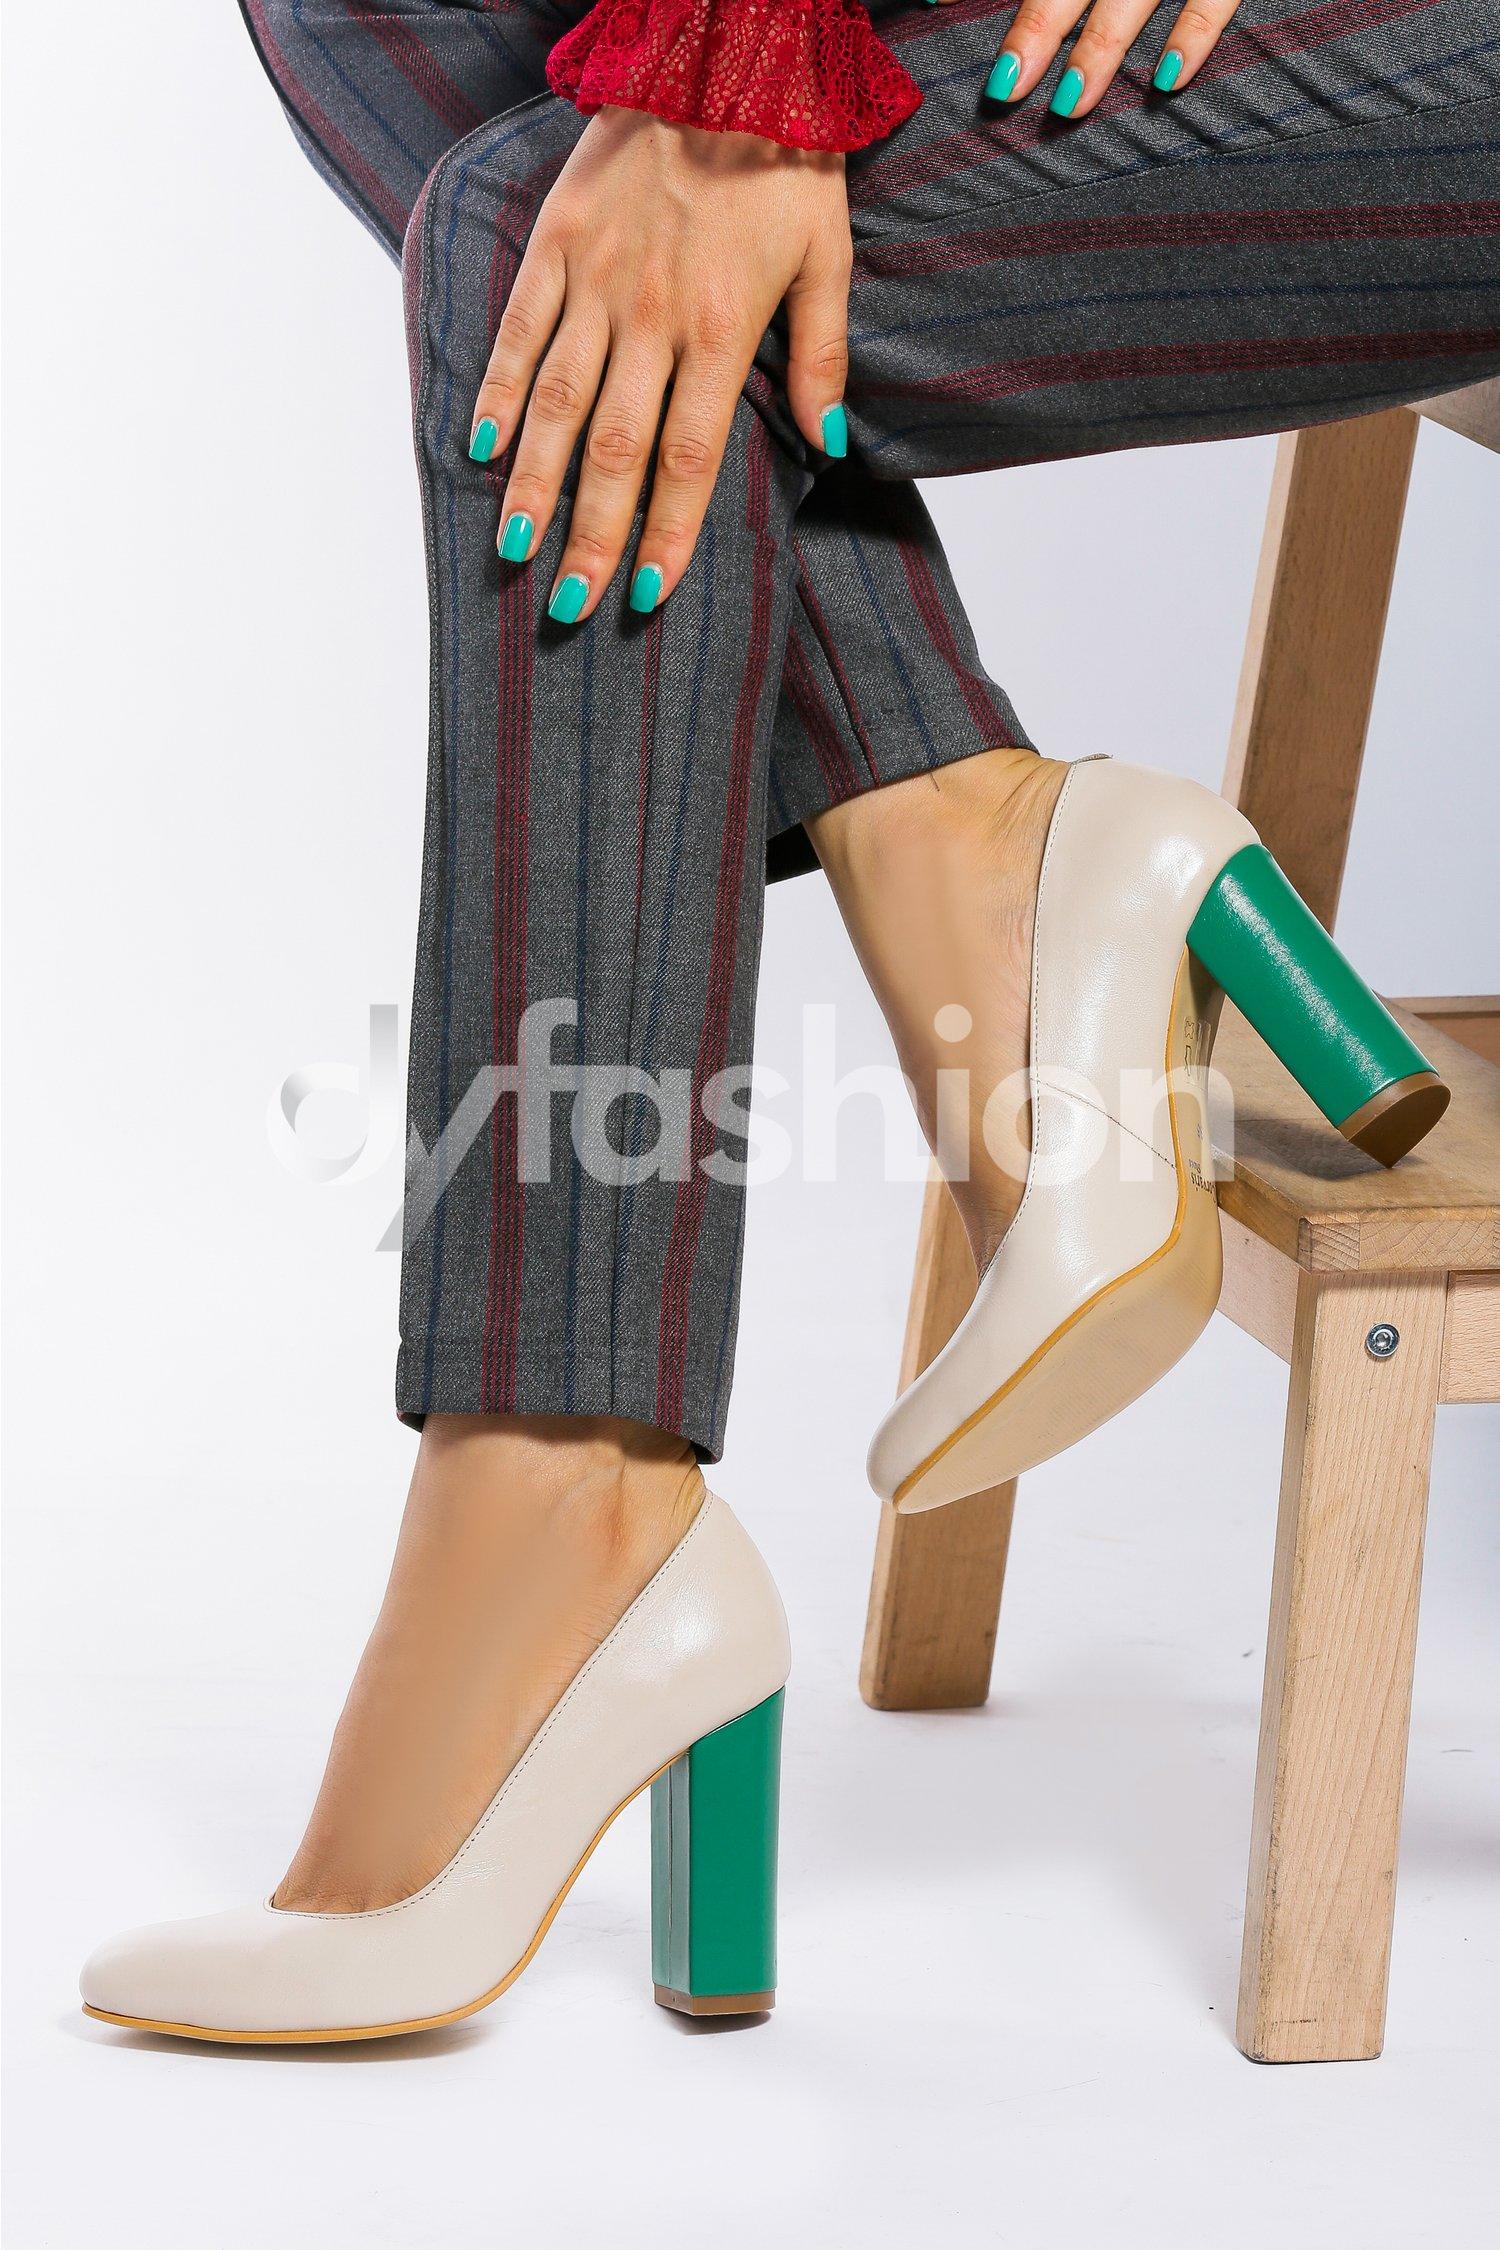 Pantofi Stiletto Crem cu Toc Verde